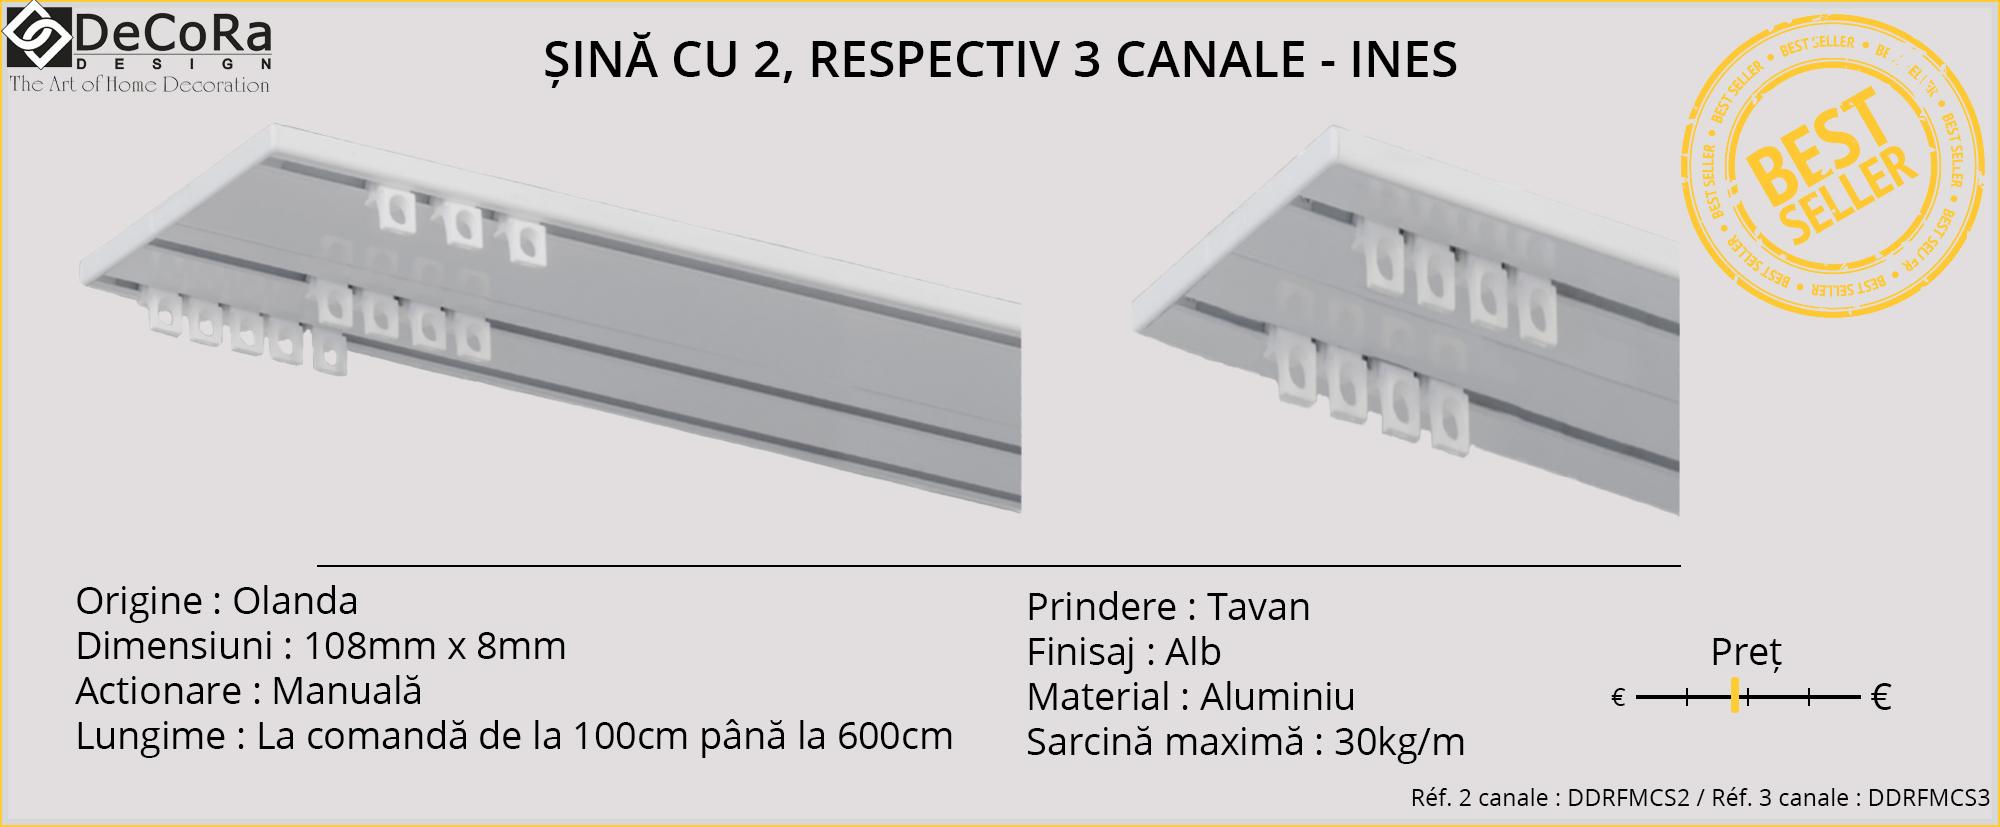 Sina cu 2, respectiv 3 canale - INES, din Olanda, cu actionare manuala, prindere in tavan, material aluminiu